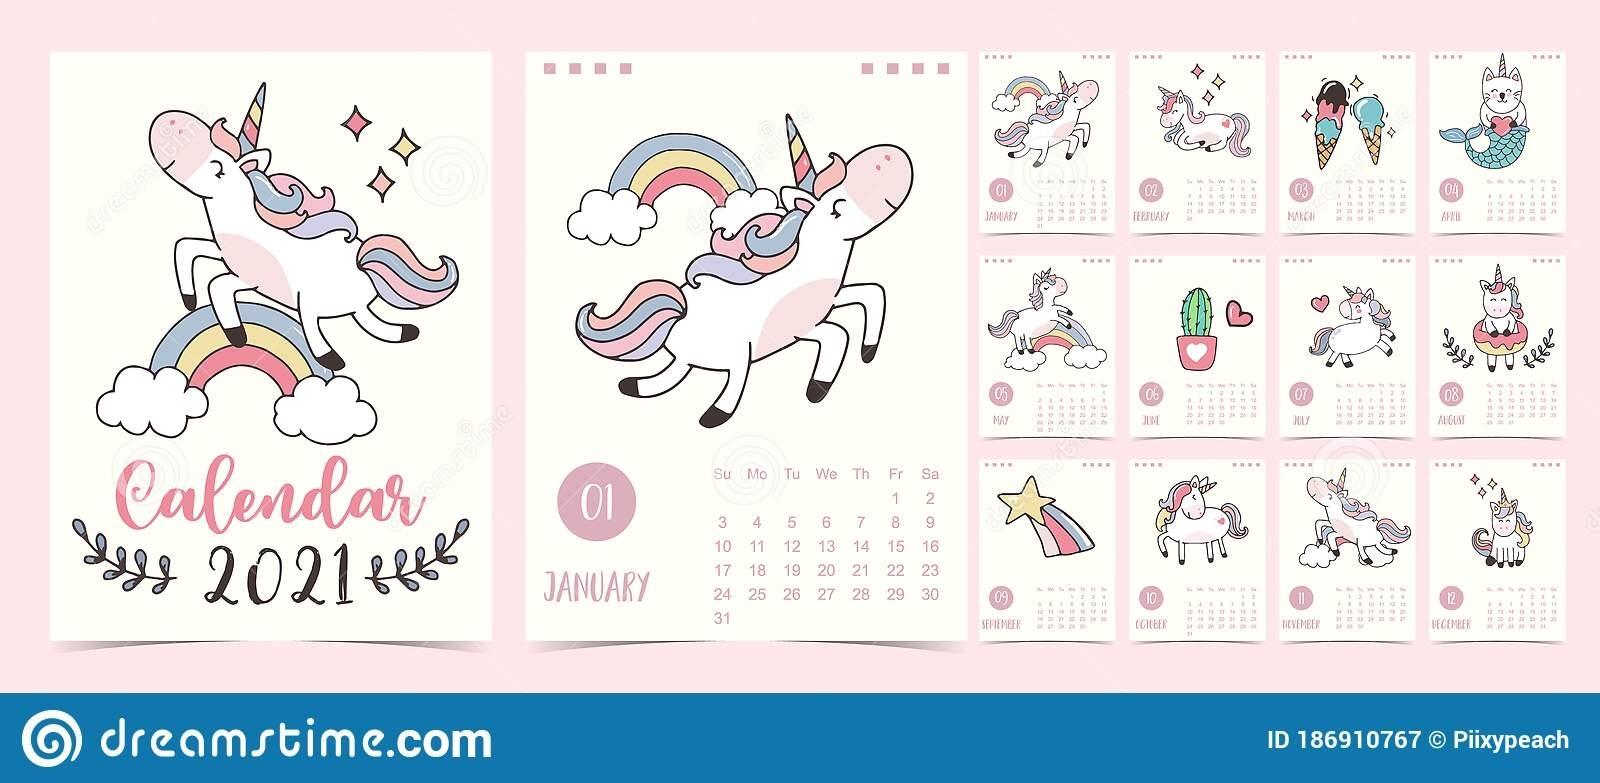 Doodle Pastel Calendar Set 2021 With Unicorn,Rainbow,Ice